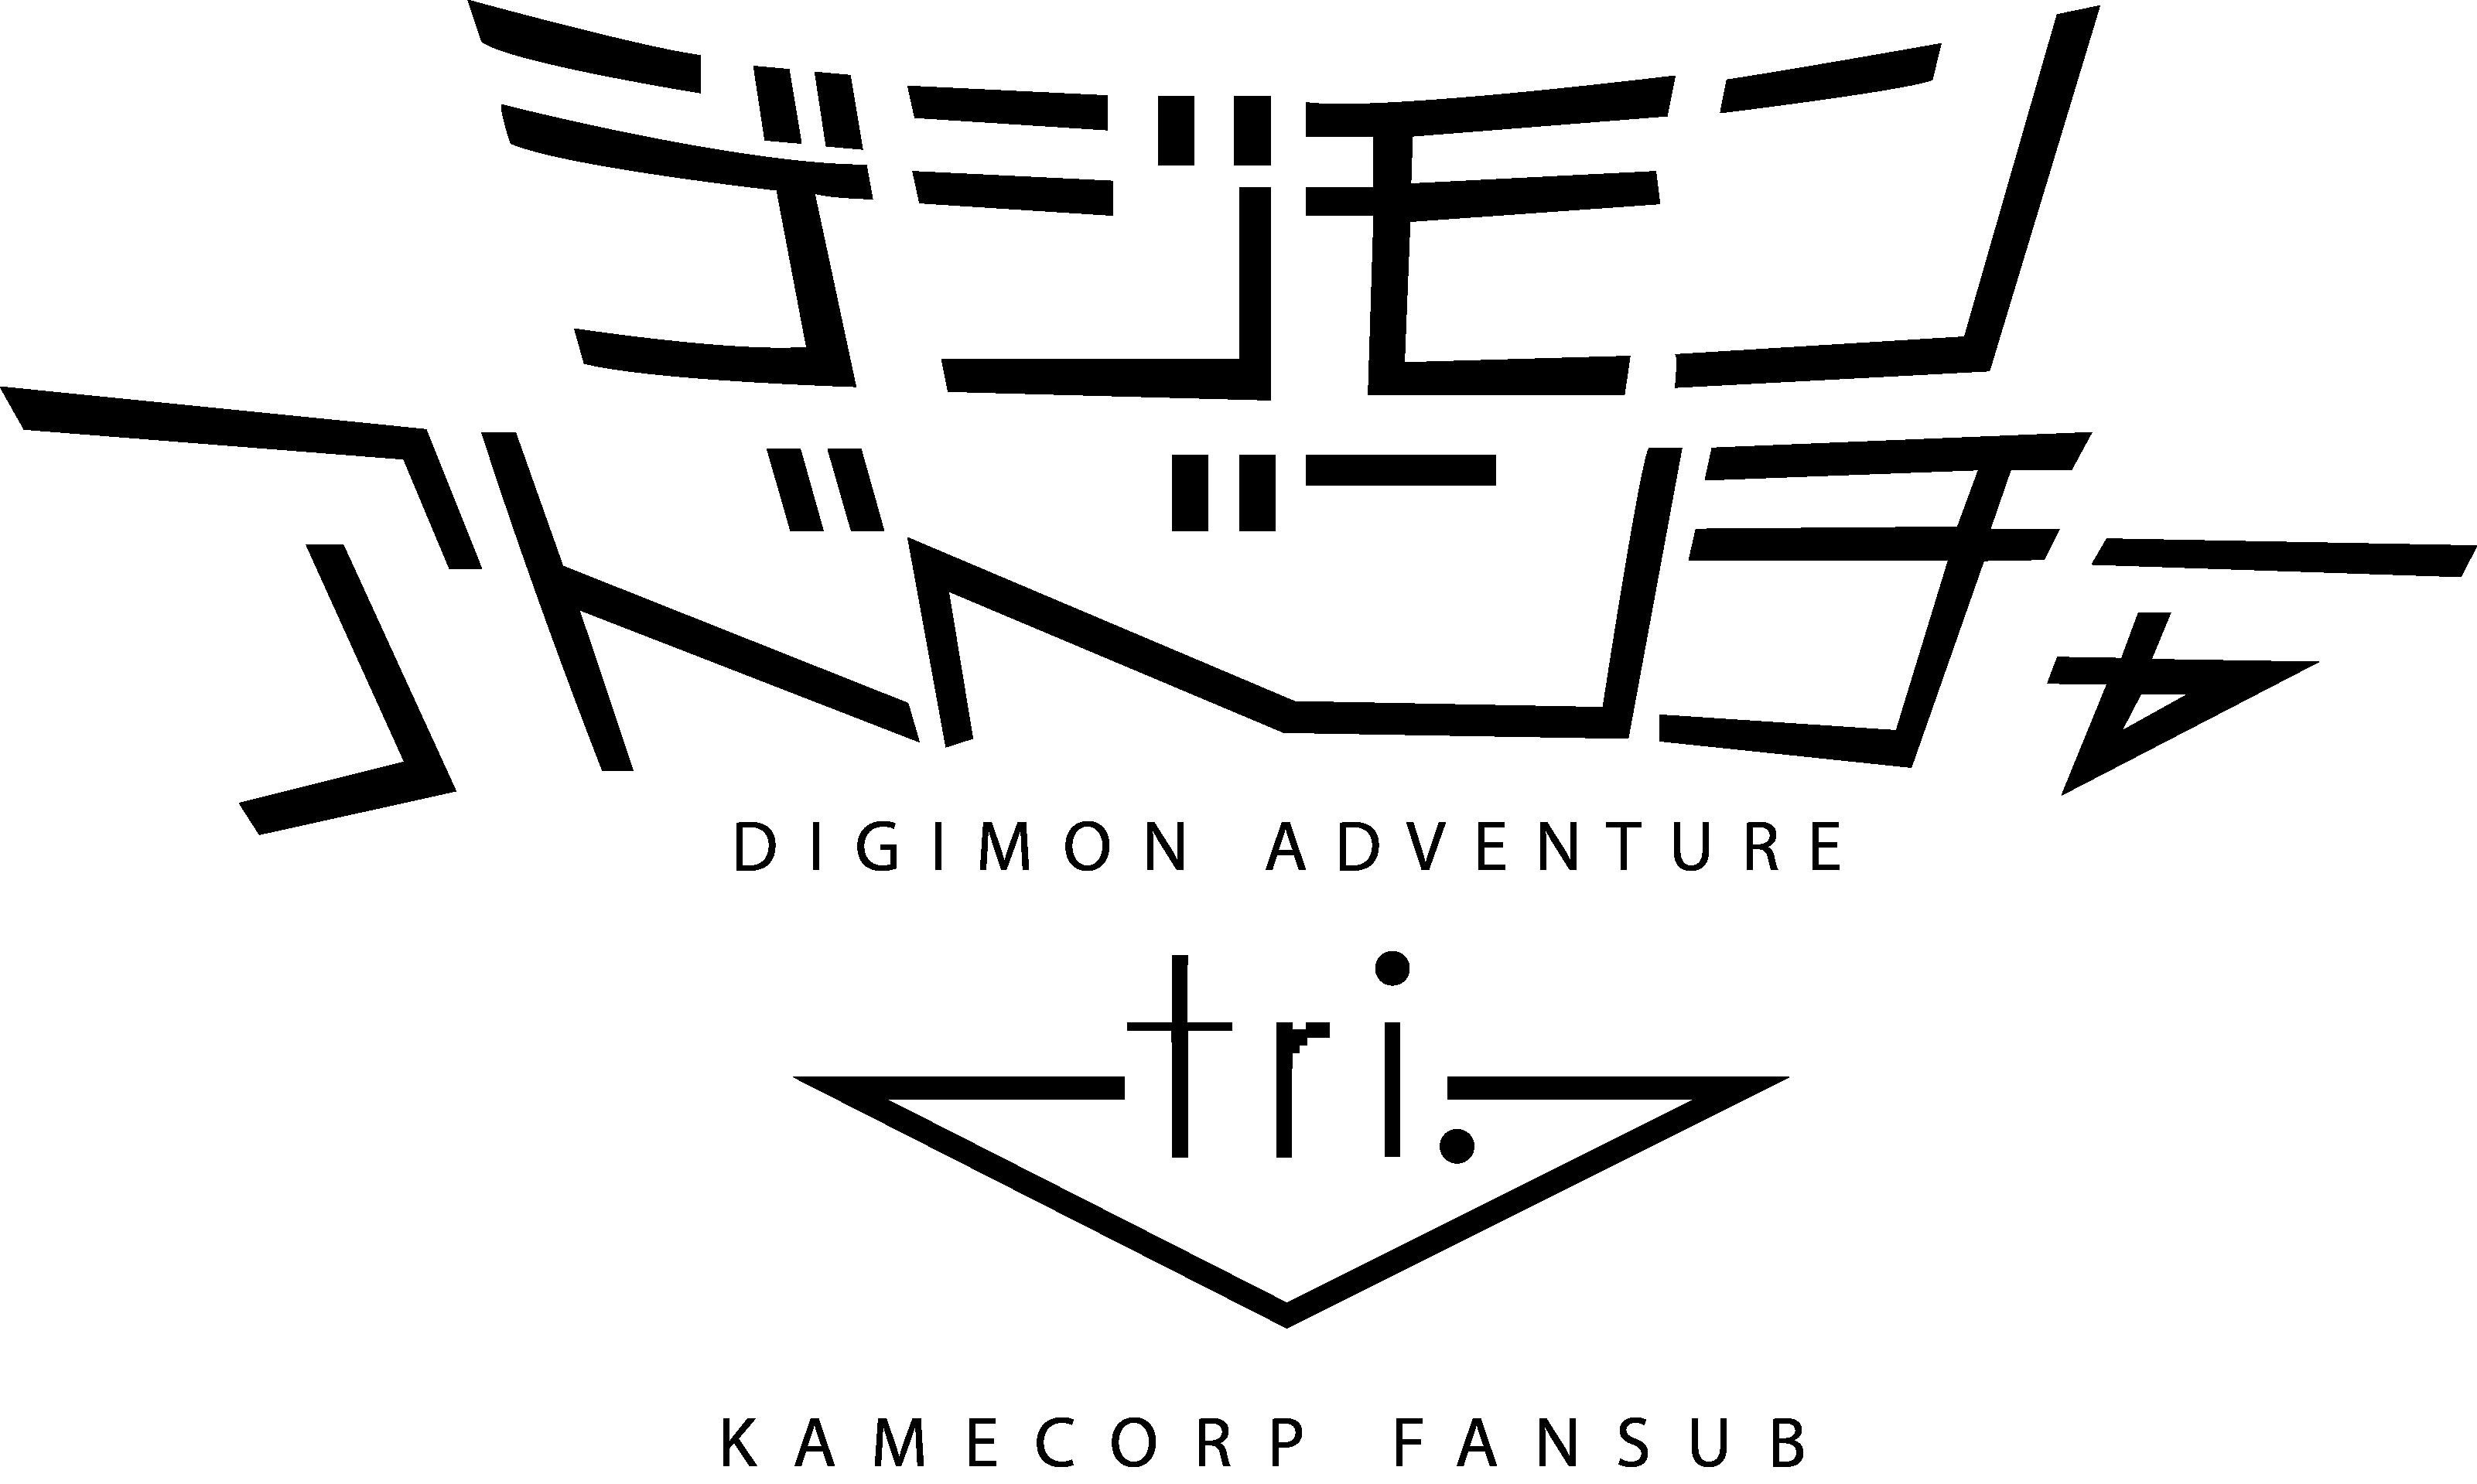 Logo digimon kamecorp fansub